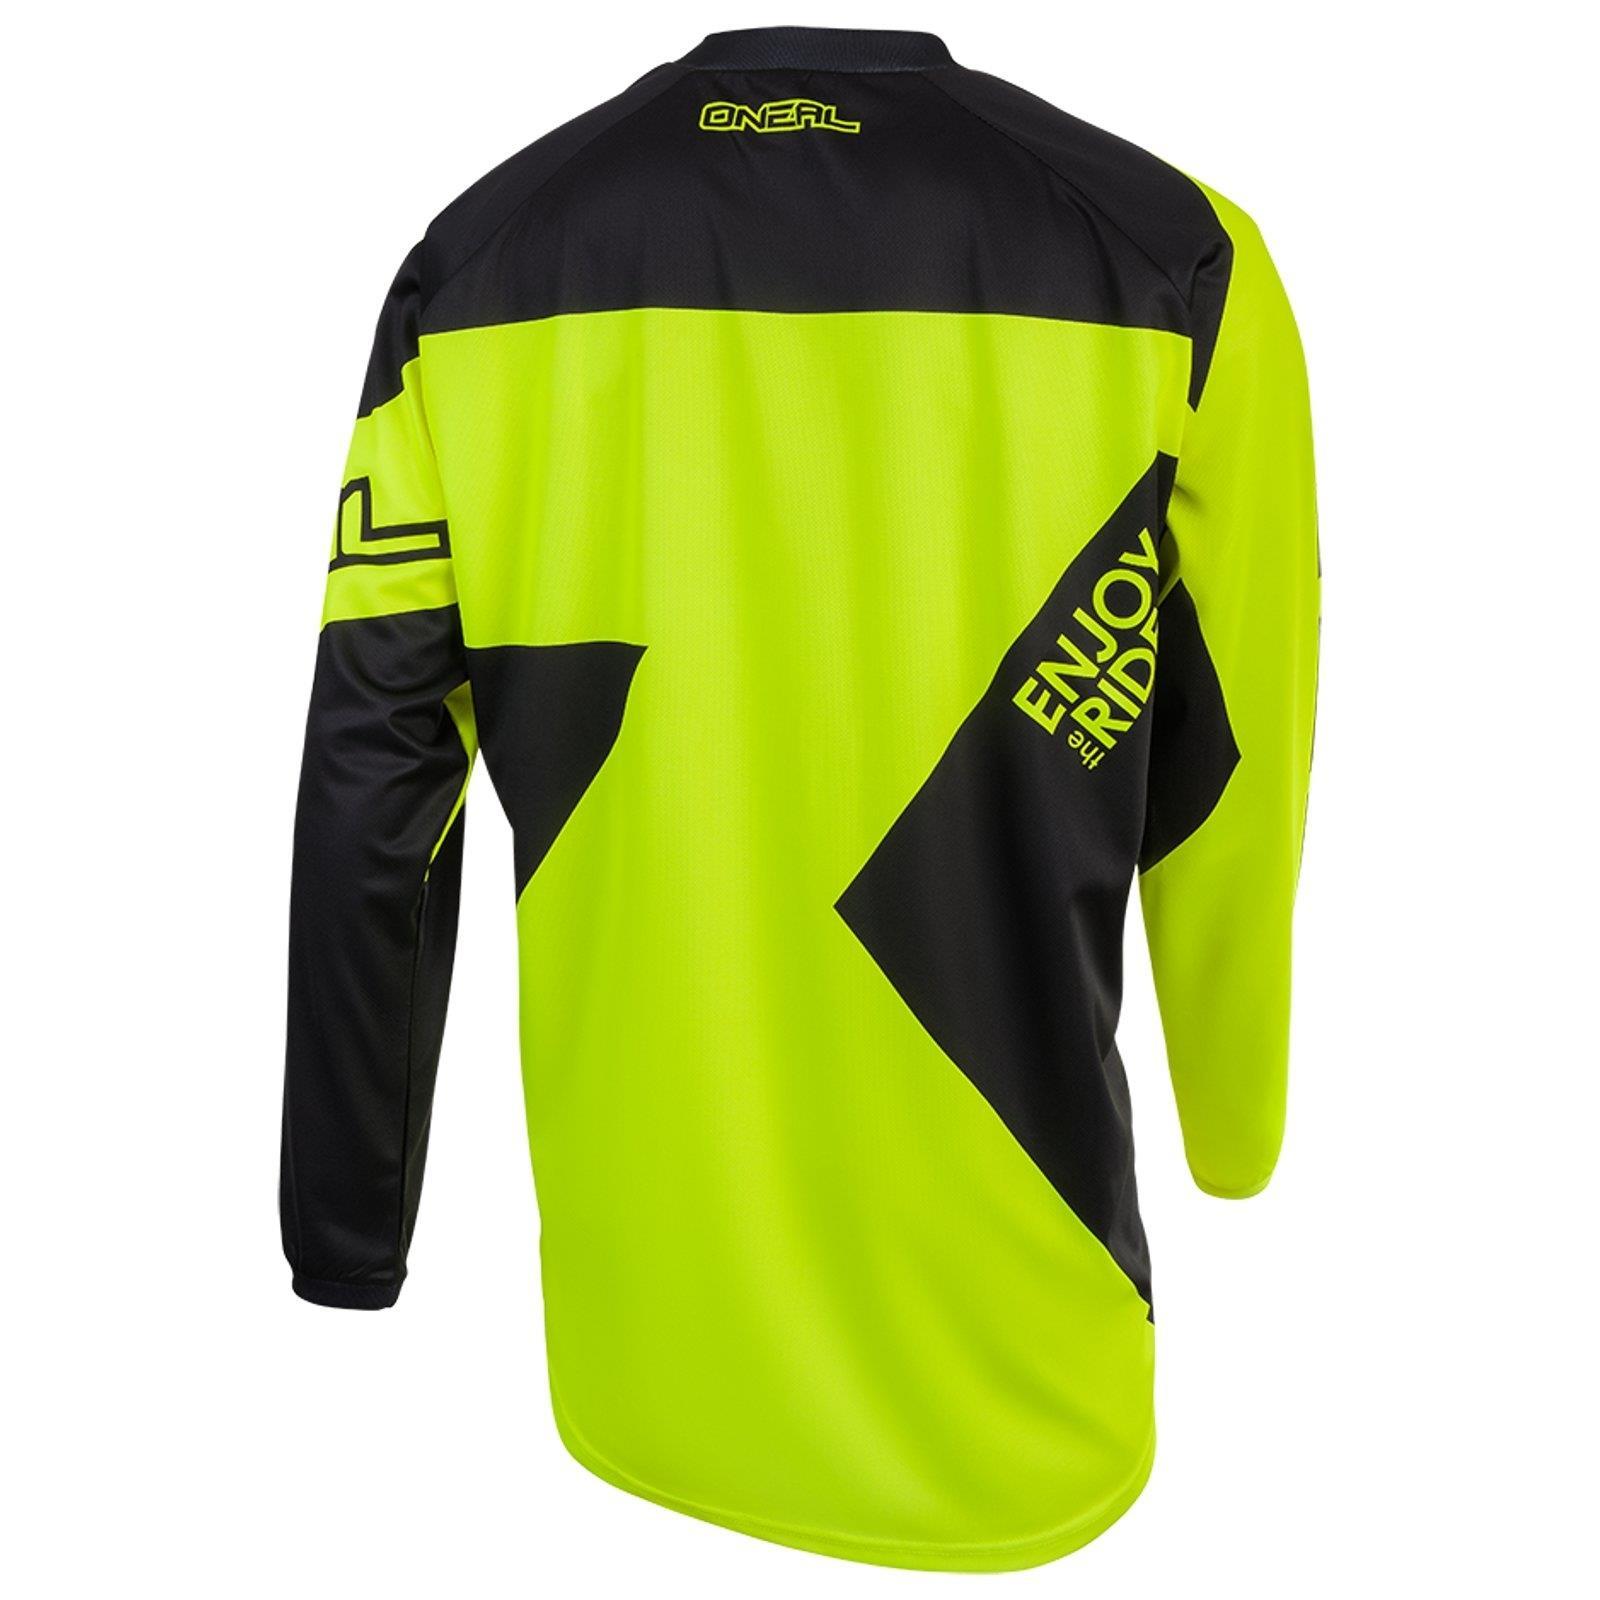 O-039-Neal-elemento-Mayhem-JERSEY-Racewear-Motocross-Maglia-MX-DH-FR-MTB-MOUNTAIN-BIKE miniatura 56